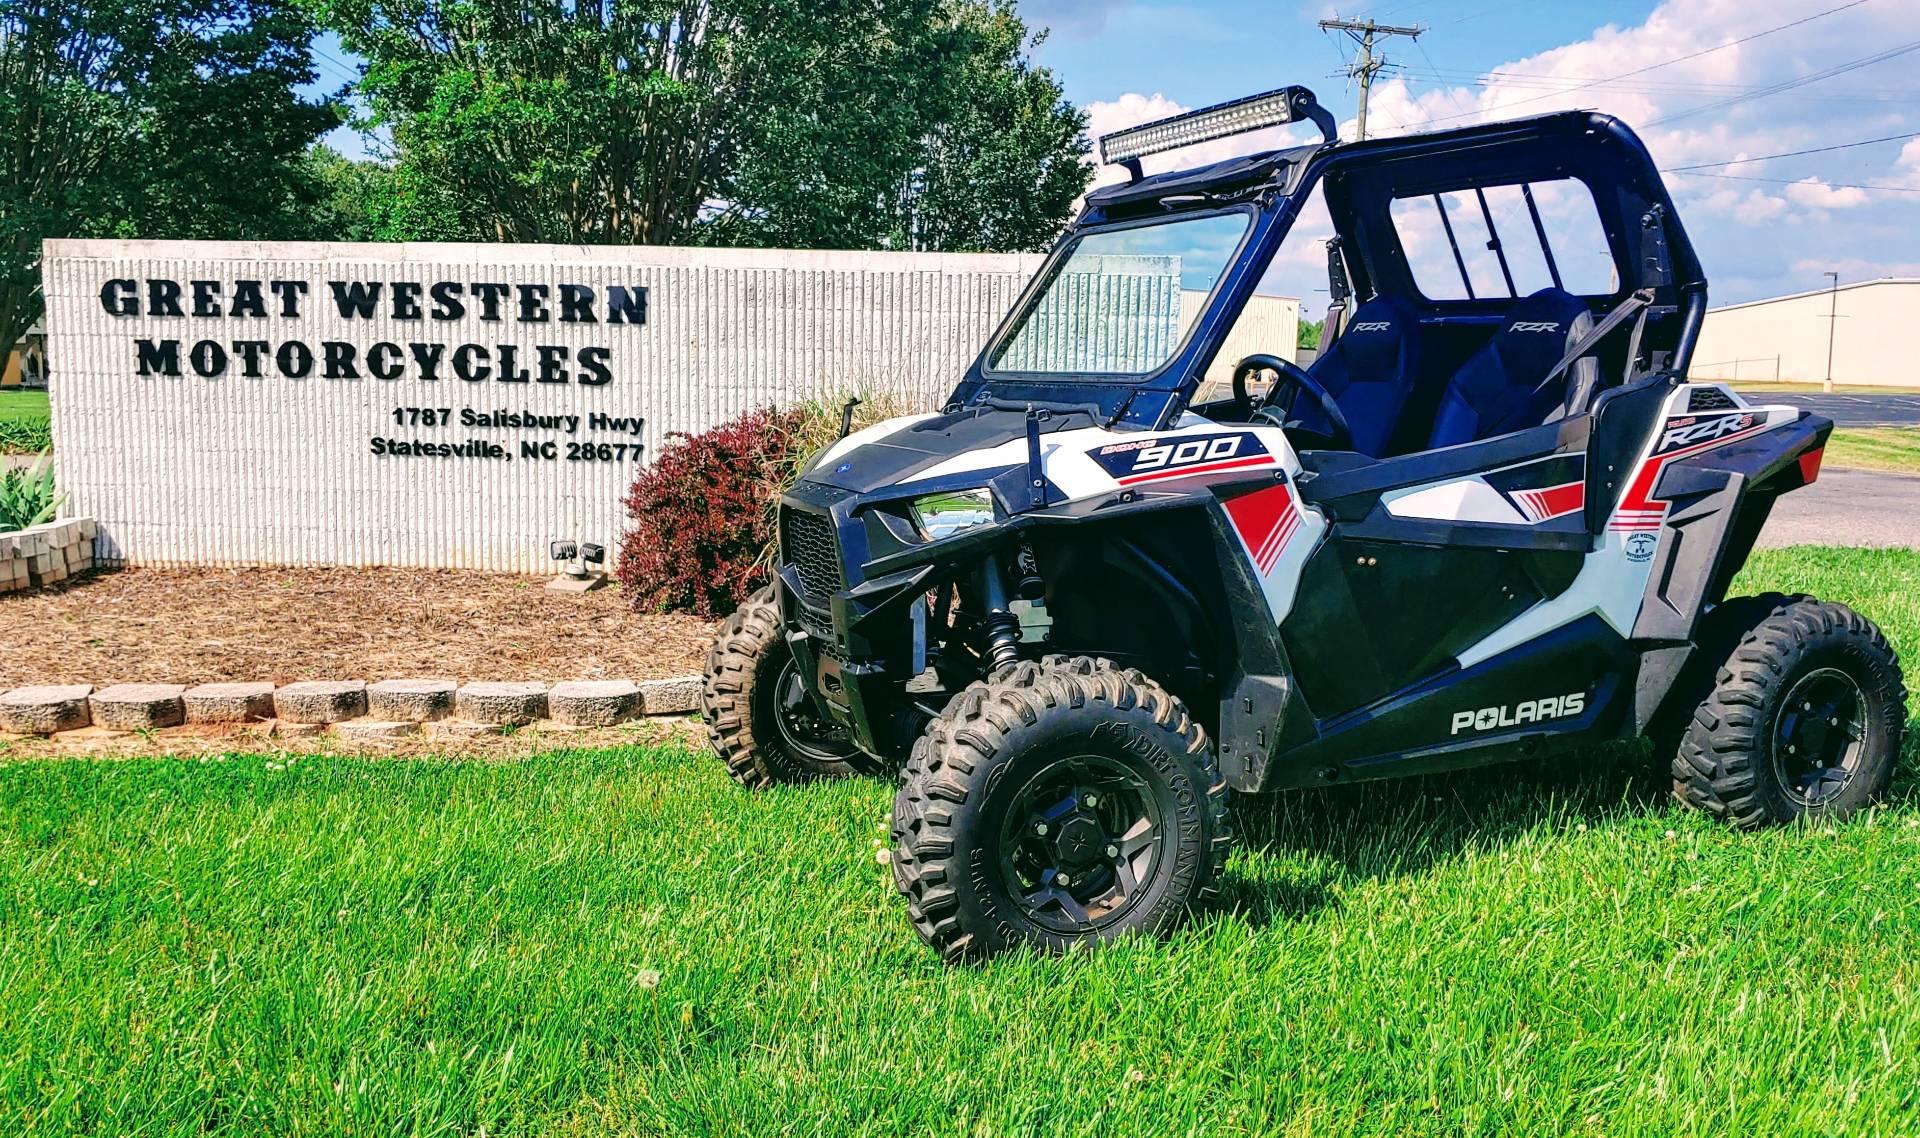 2015 Polaris Rzr >> 2015 Polaris Rzr S 900 In Statesville North Carolina